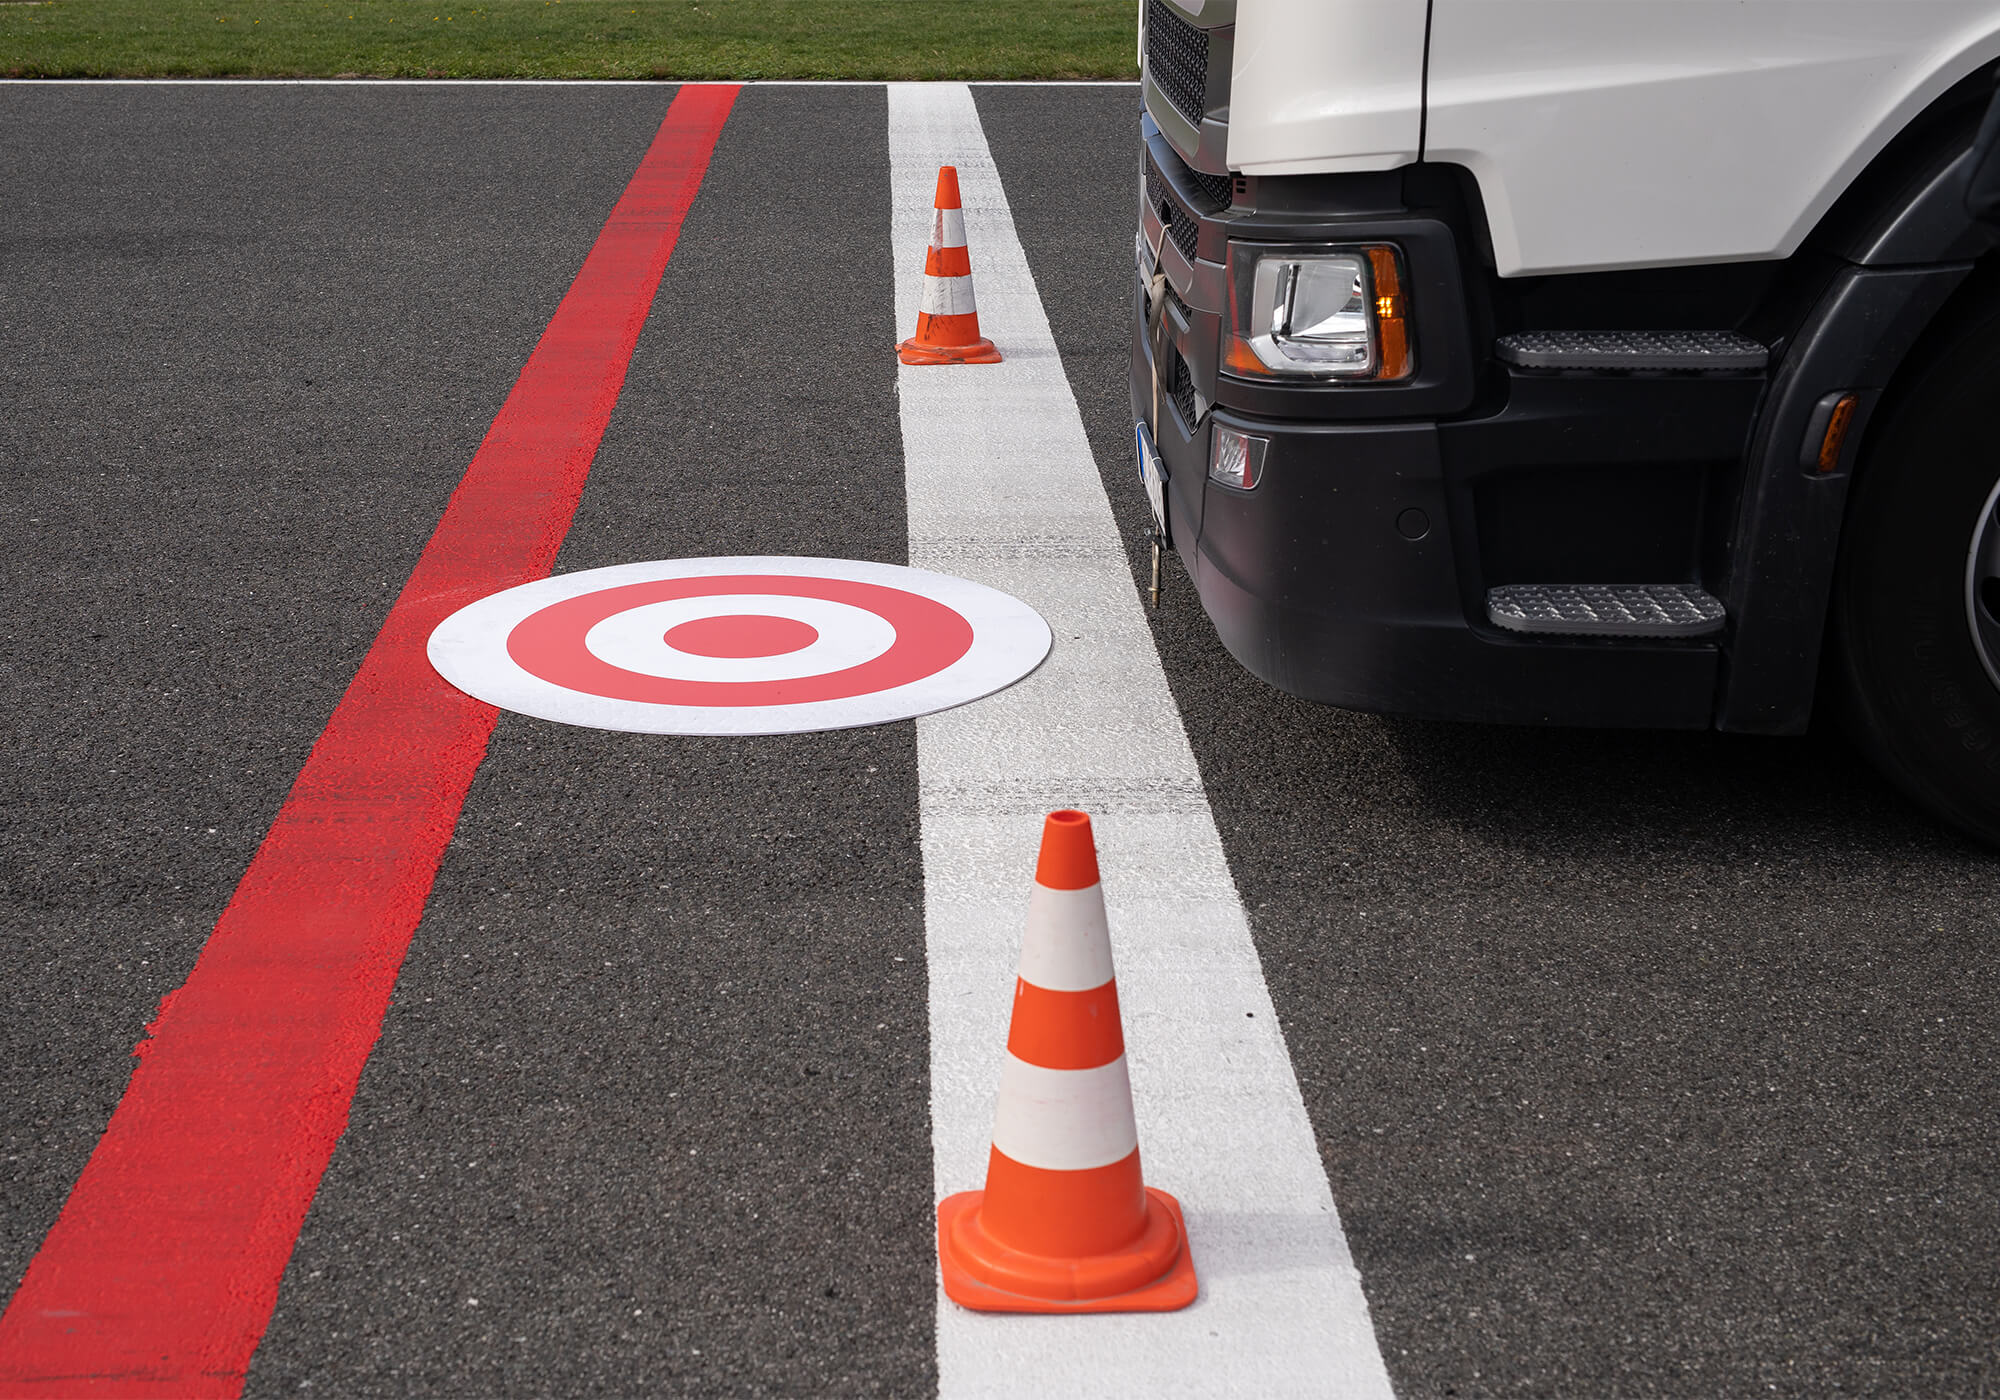 SKIDTRUCK Driver Training